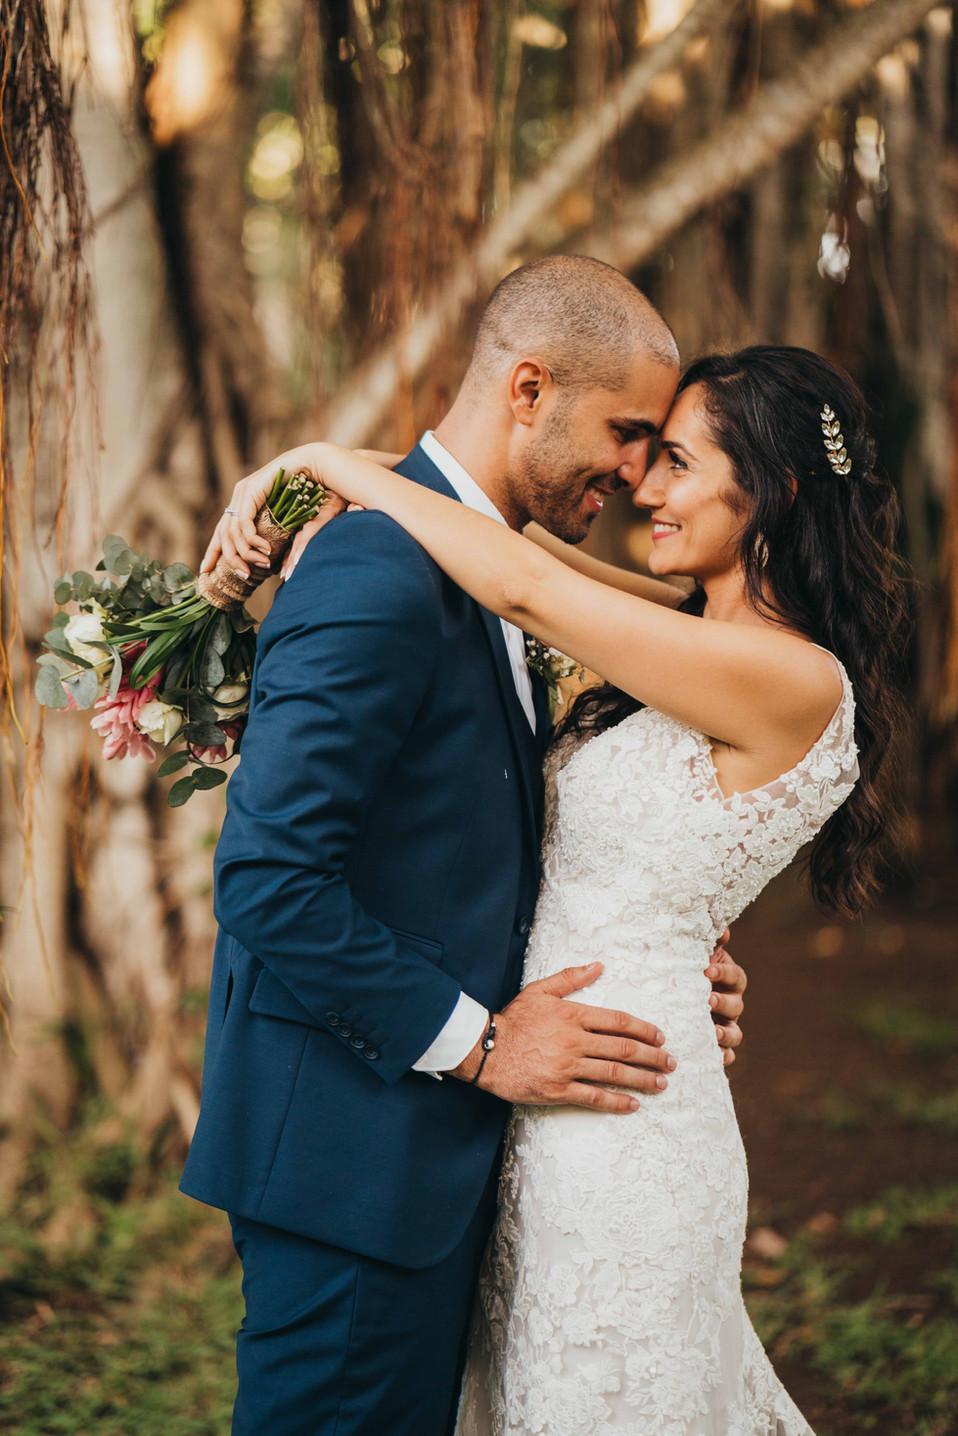 Sofia and Nicolas - Wedding in Mauritius